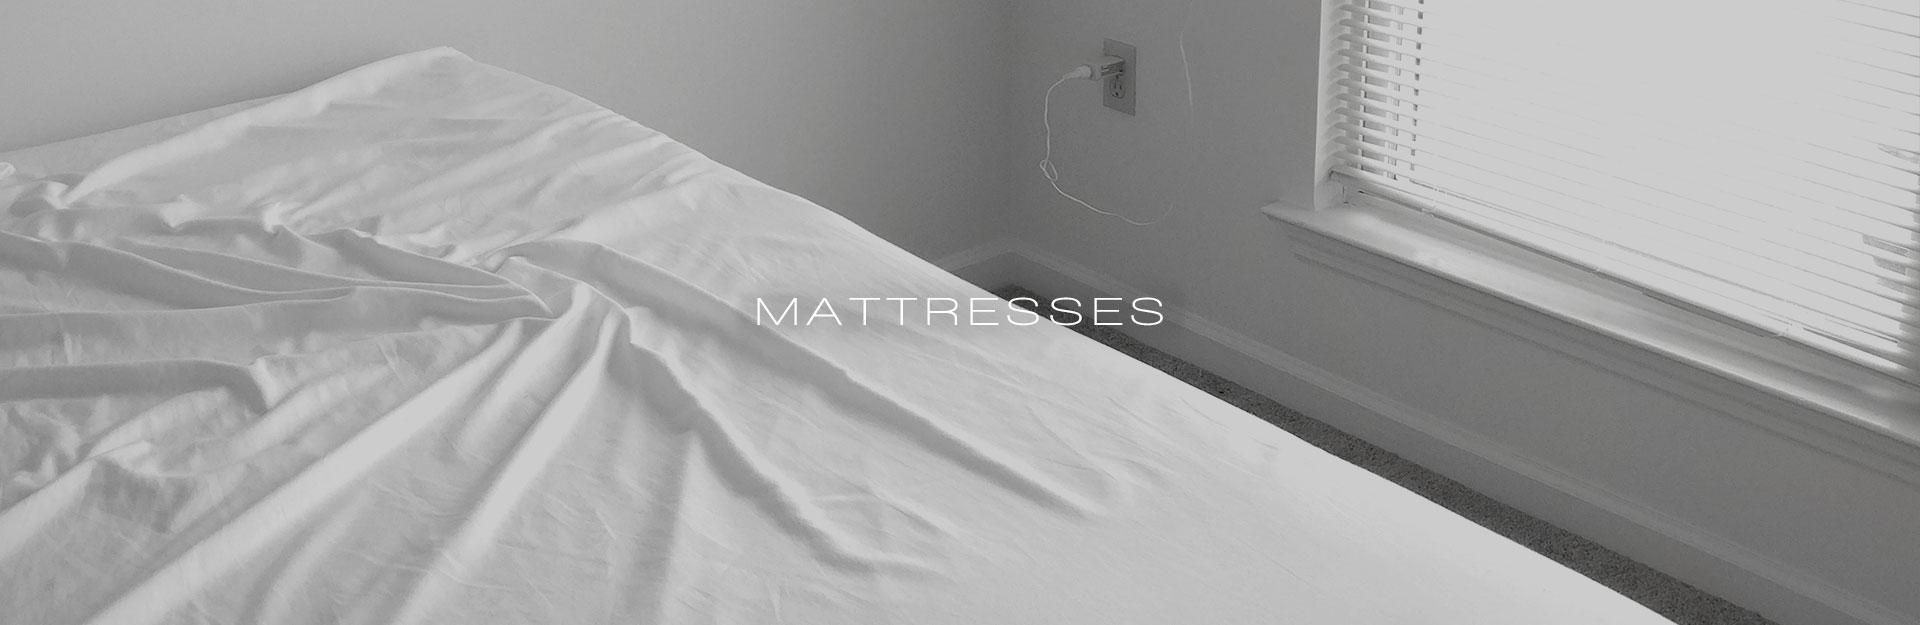 abh-mattresses.jpg